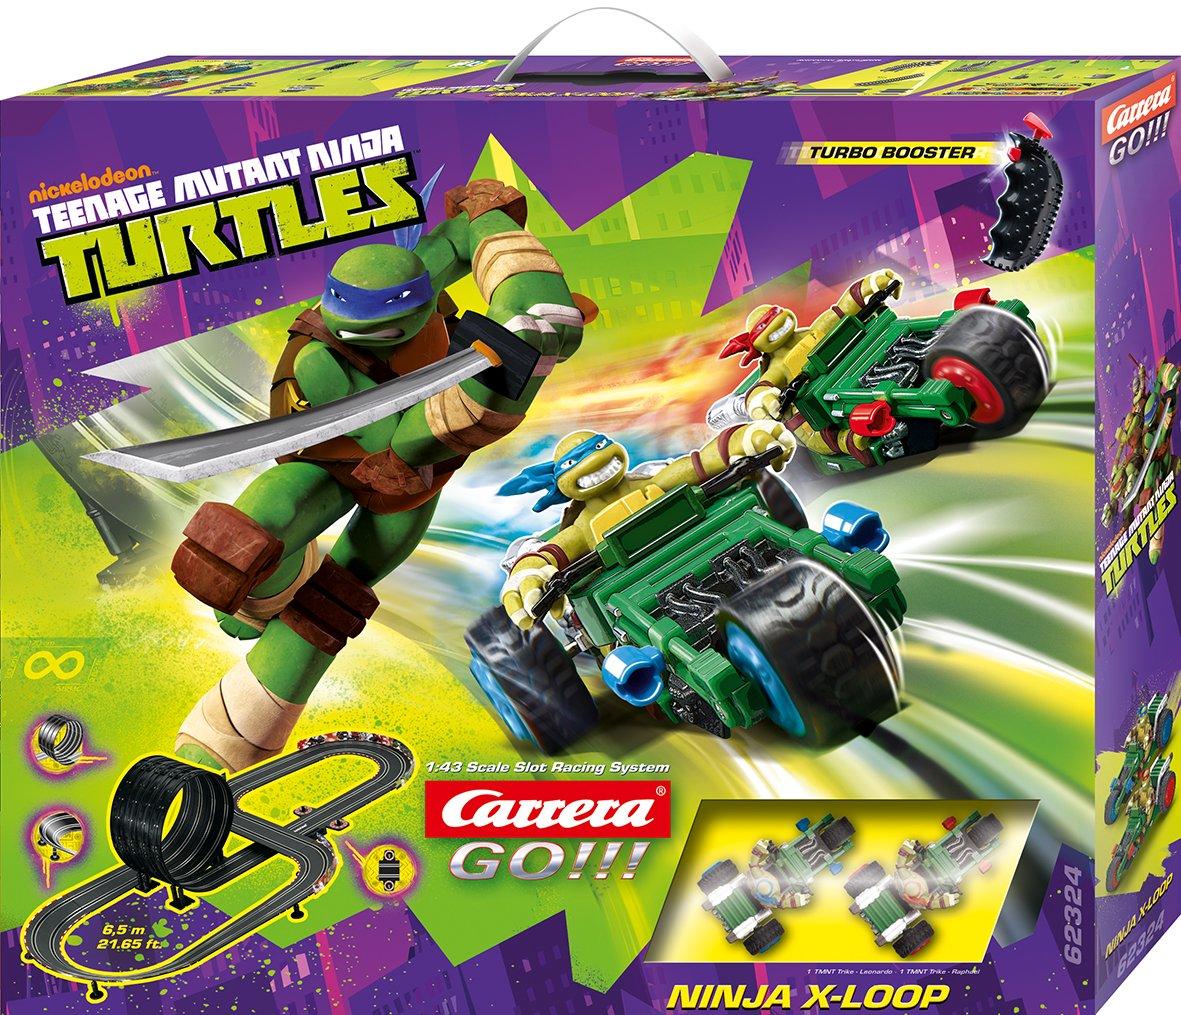 Carrera - Circuito GO 143 Ninja X-Loop (Tortugas Ninja) 6.5 Metros, Escala 1:43 (20062324)